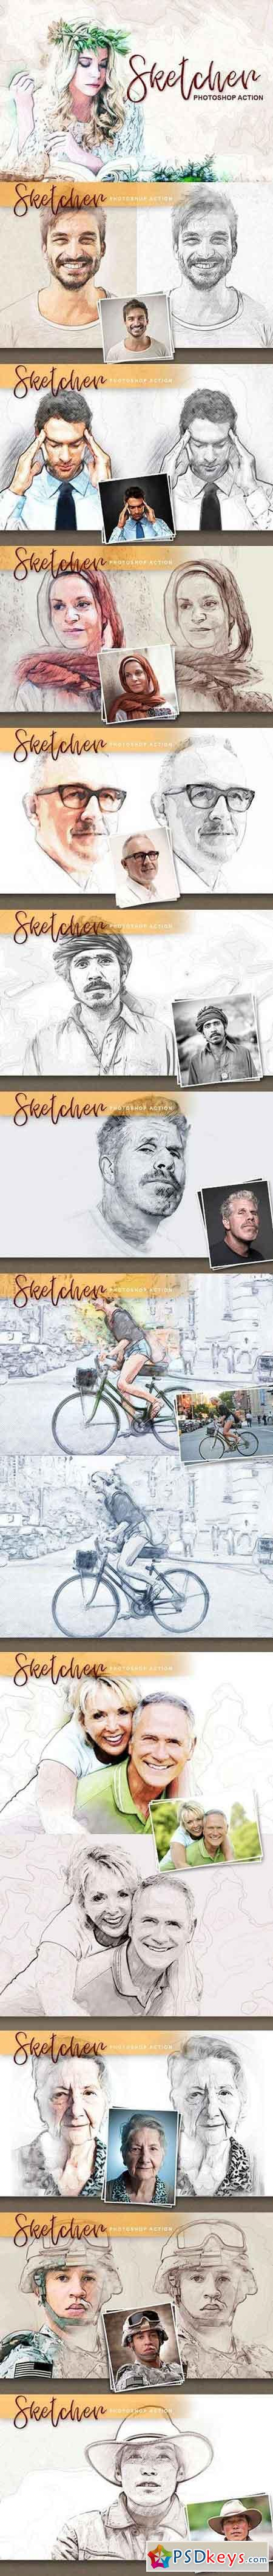 Sketcher Photoshop Action 1342836   PSDkeys   Photoshop actions